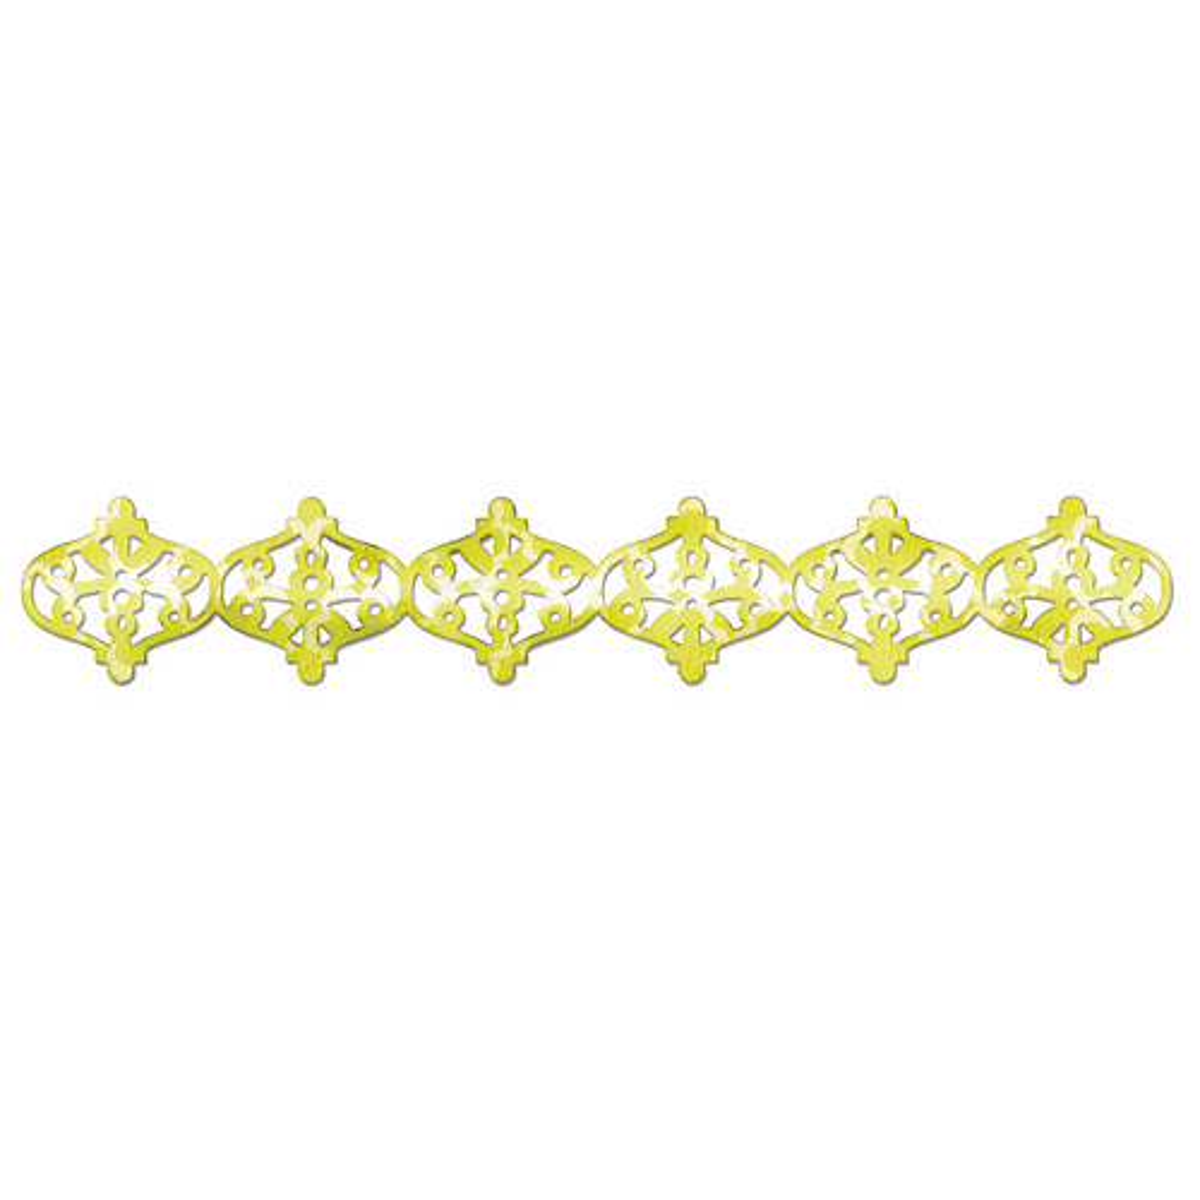 658934 Форма для вырубки Декоративные фонарики Sizzlits Decorative Strip Die